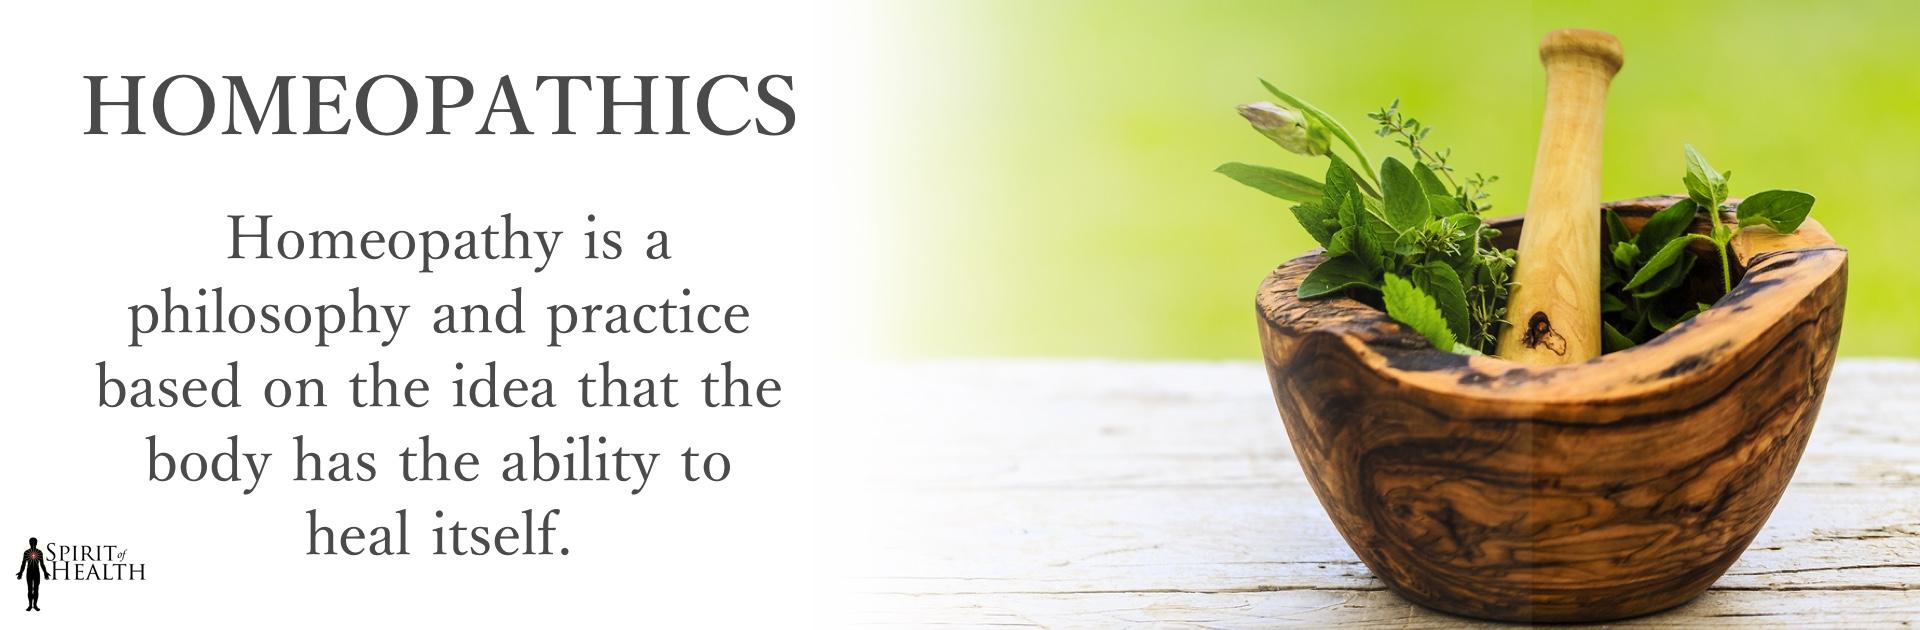 soh-store-banner-homeopathics2.jpg